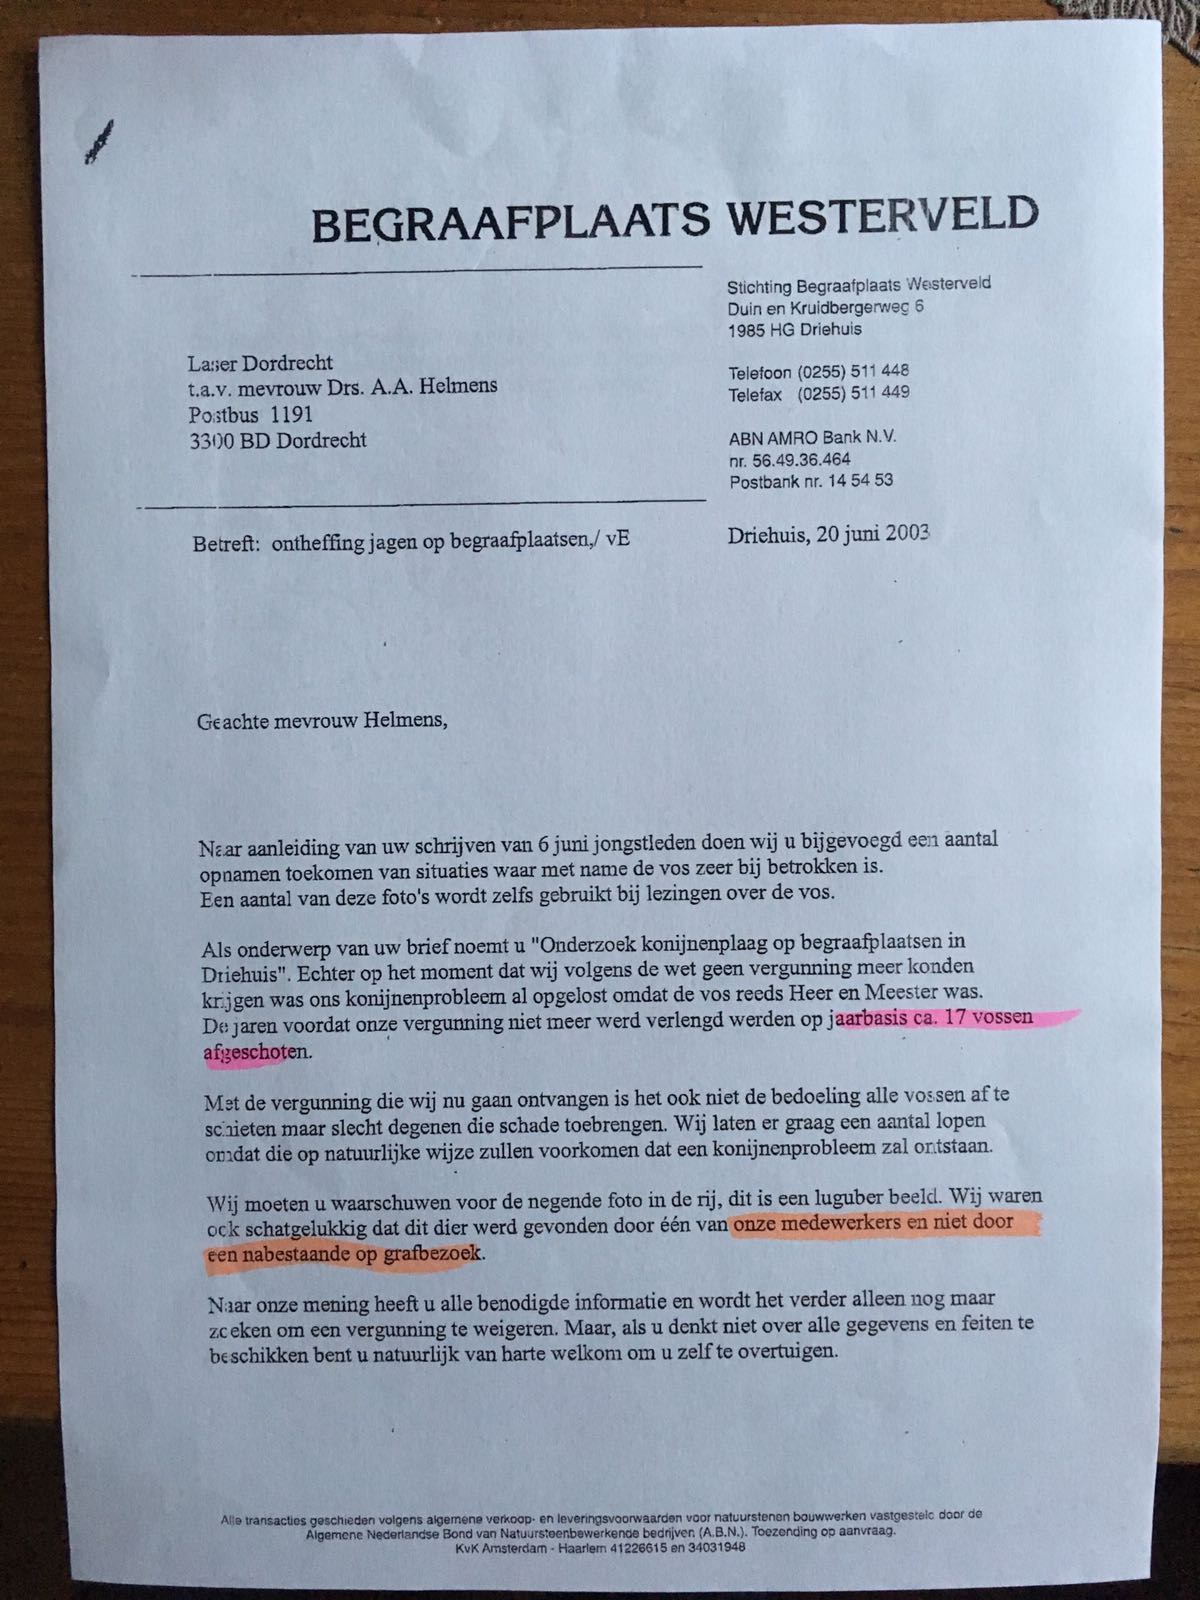 schade brief schrijven Schade Brief Schrijven | hetmakershuis